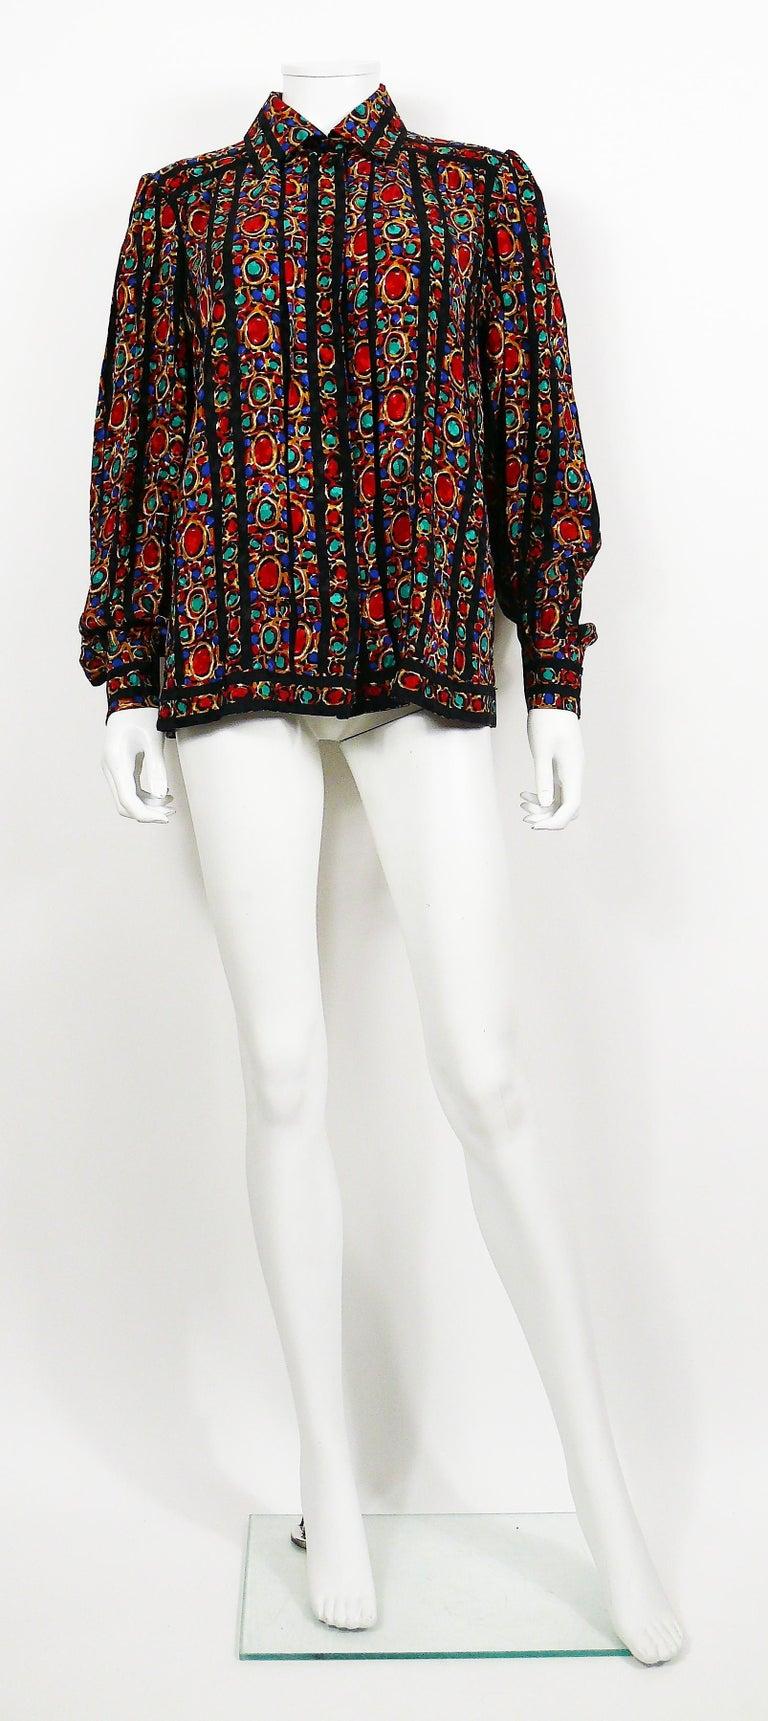 Black Yves Saint Laurent YSL Vintage Jewel Print Blouse For Sale